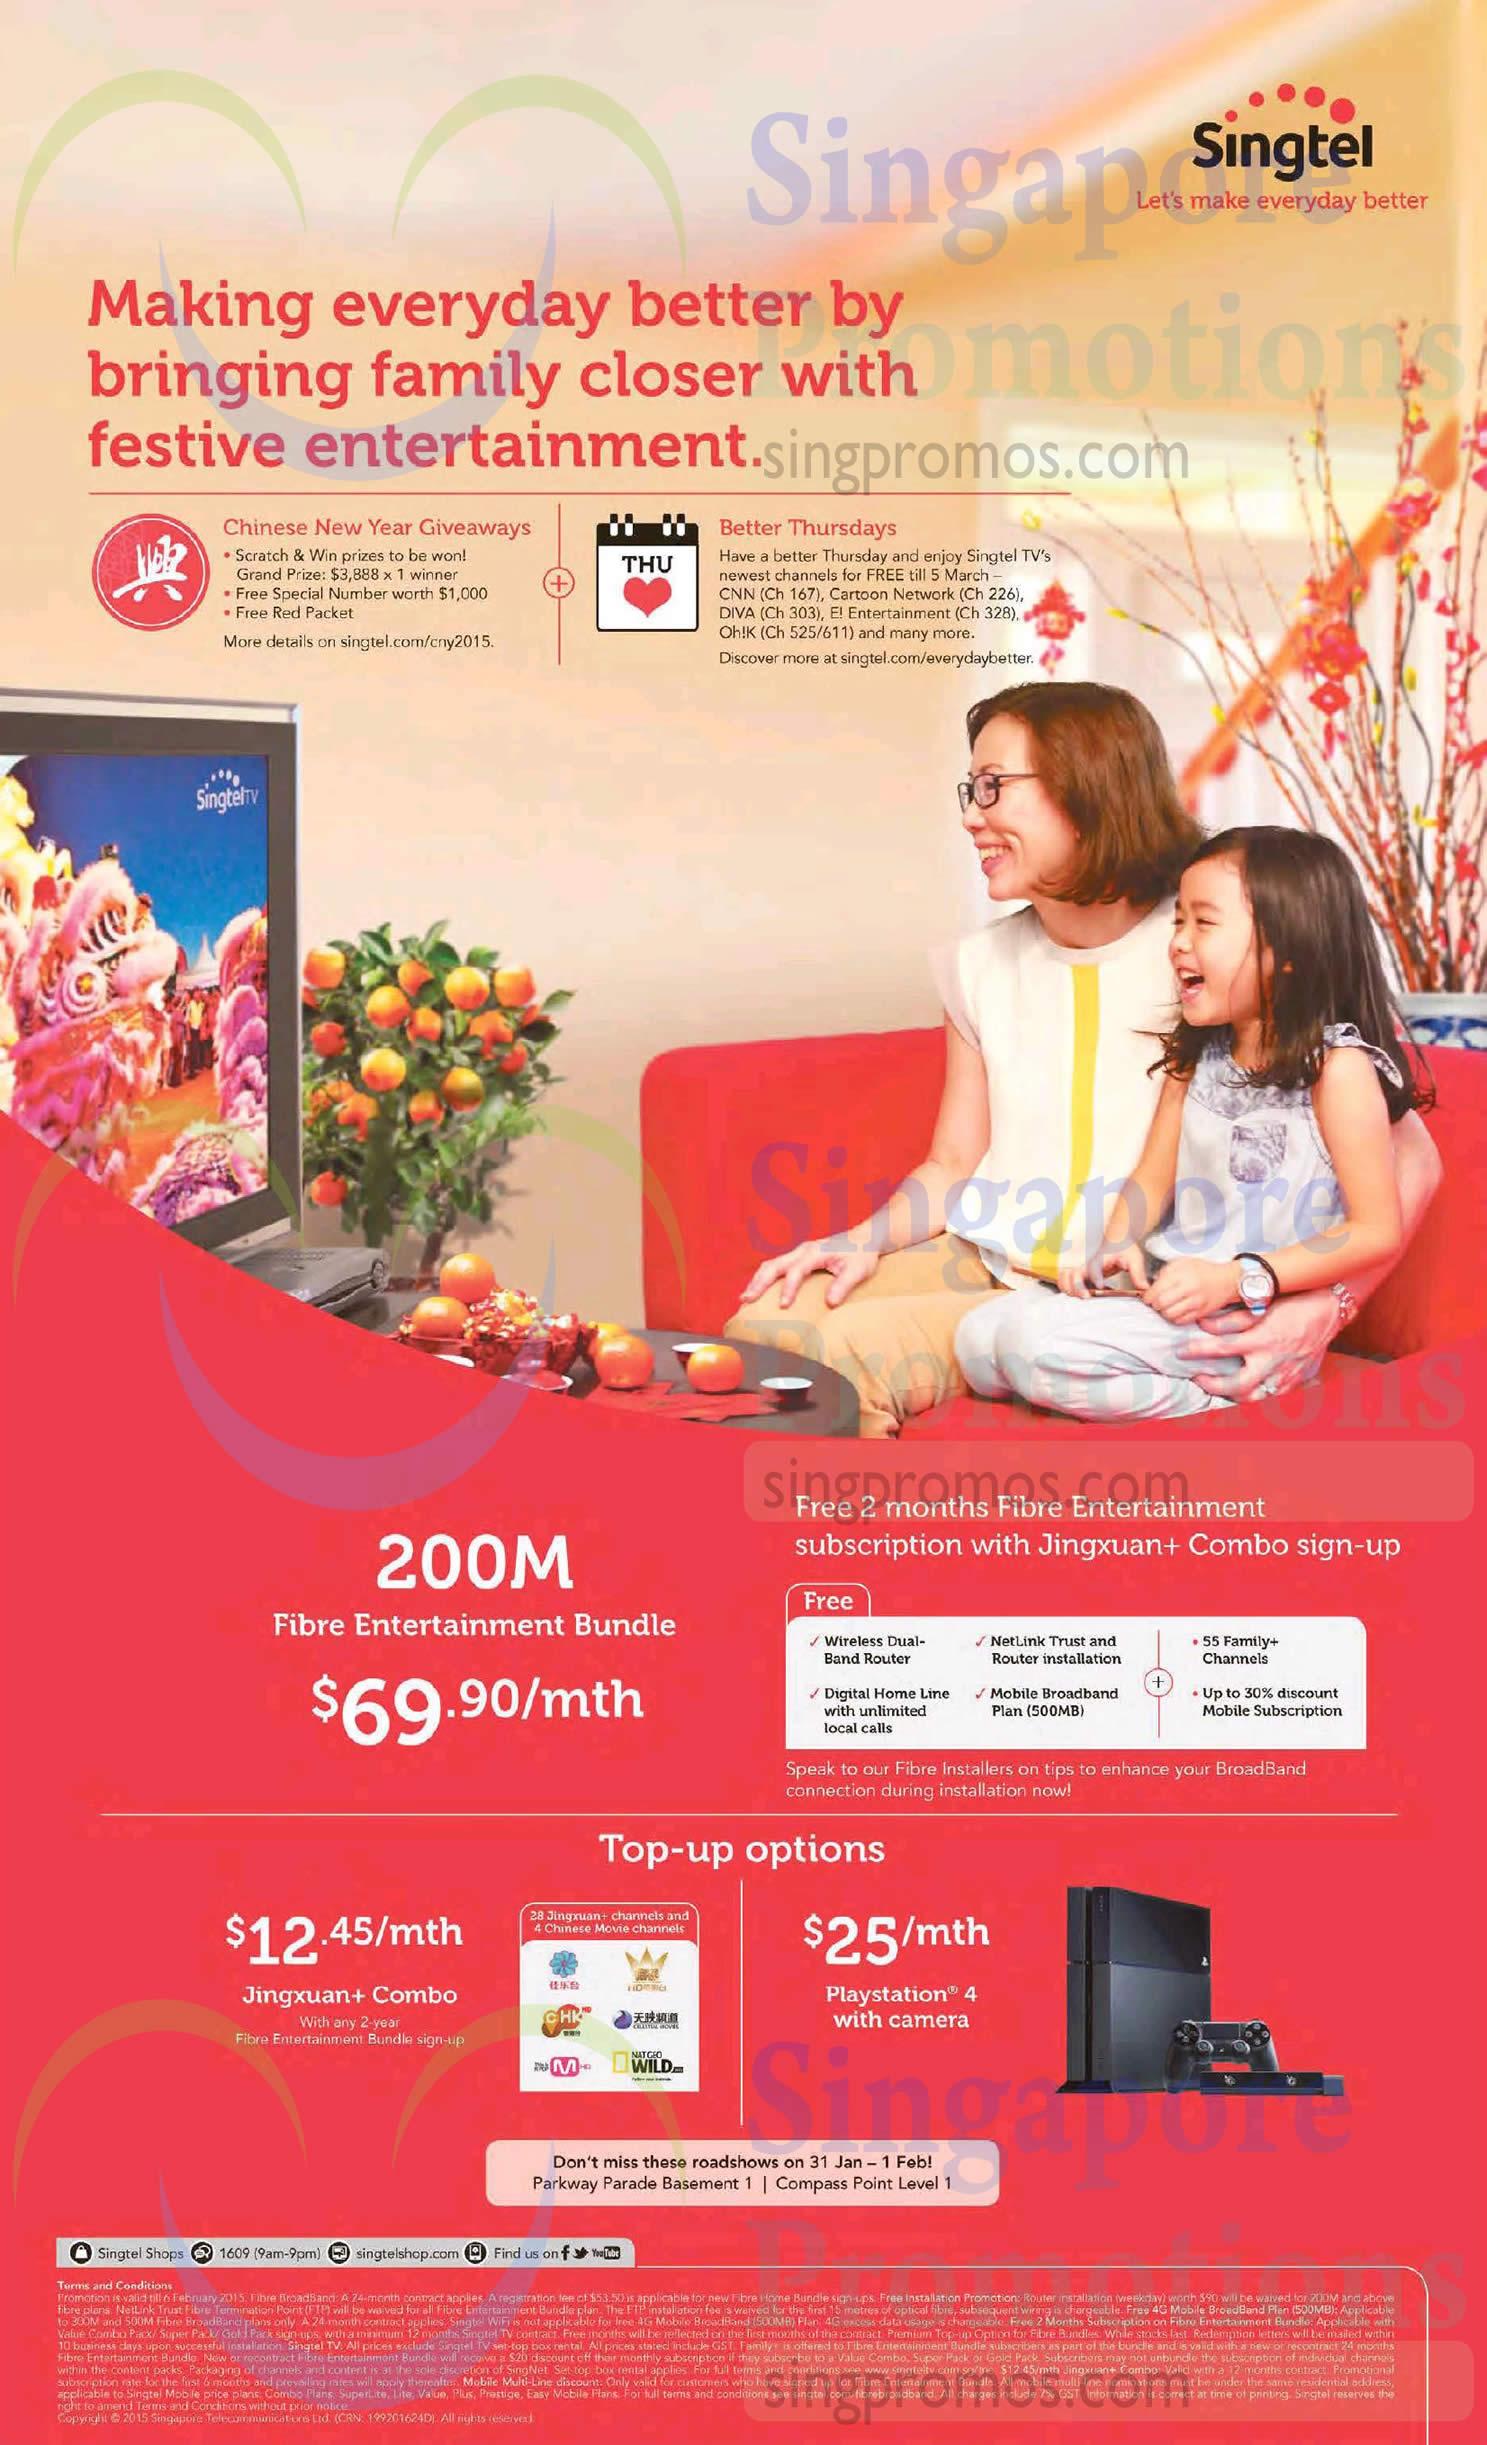 69.90 200M Fibre Entertainment Bundle, 12.45 Jingxuan Combo, 25.00 Playstation 4 With Camera